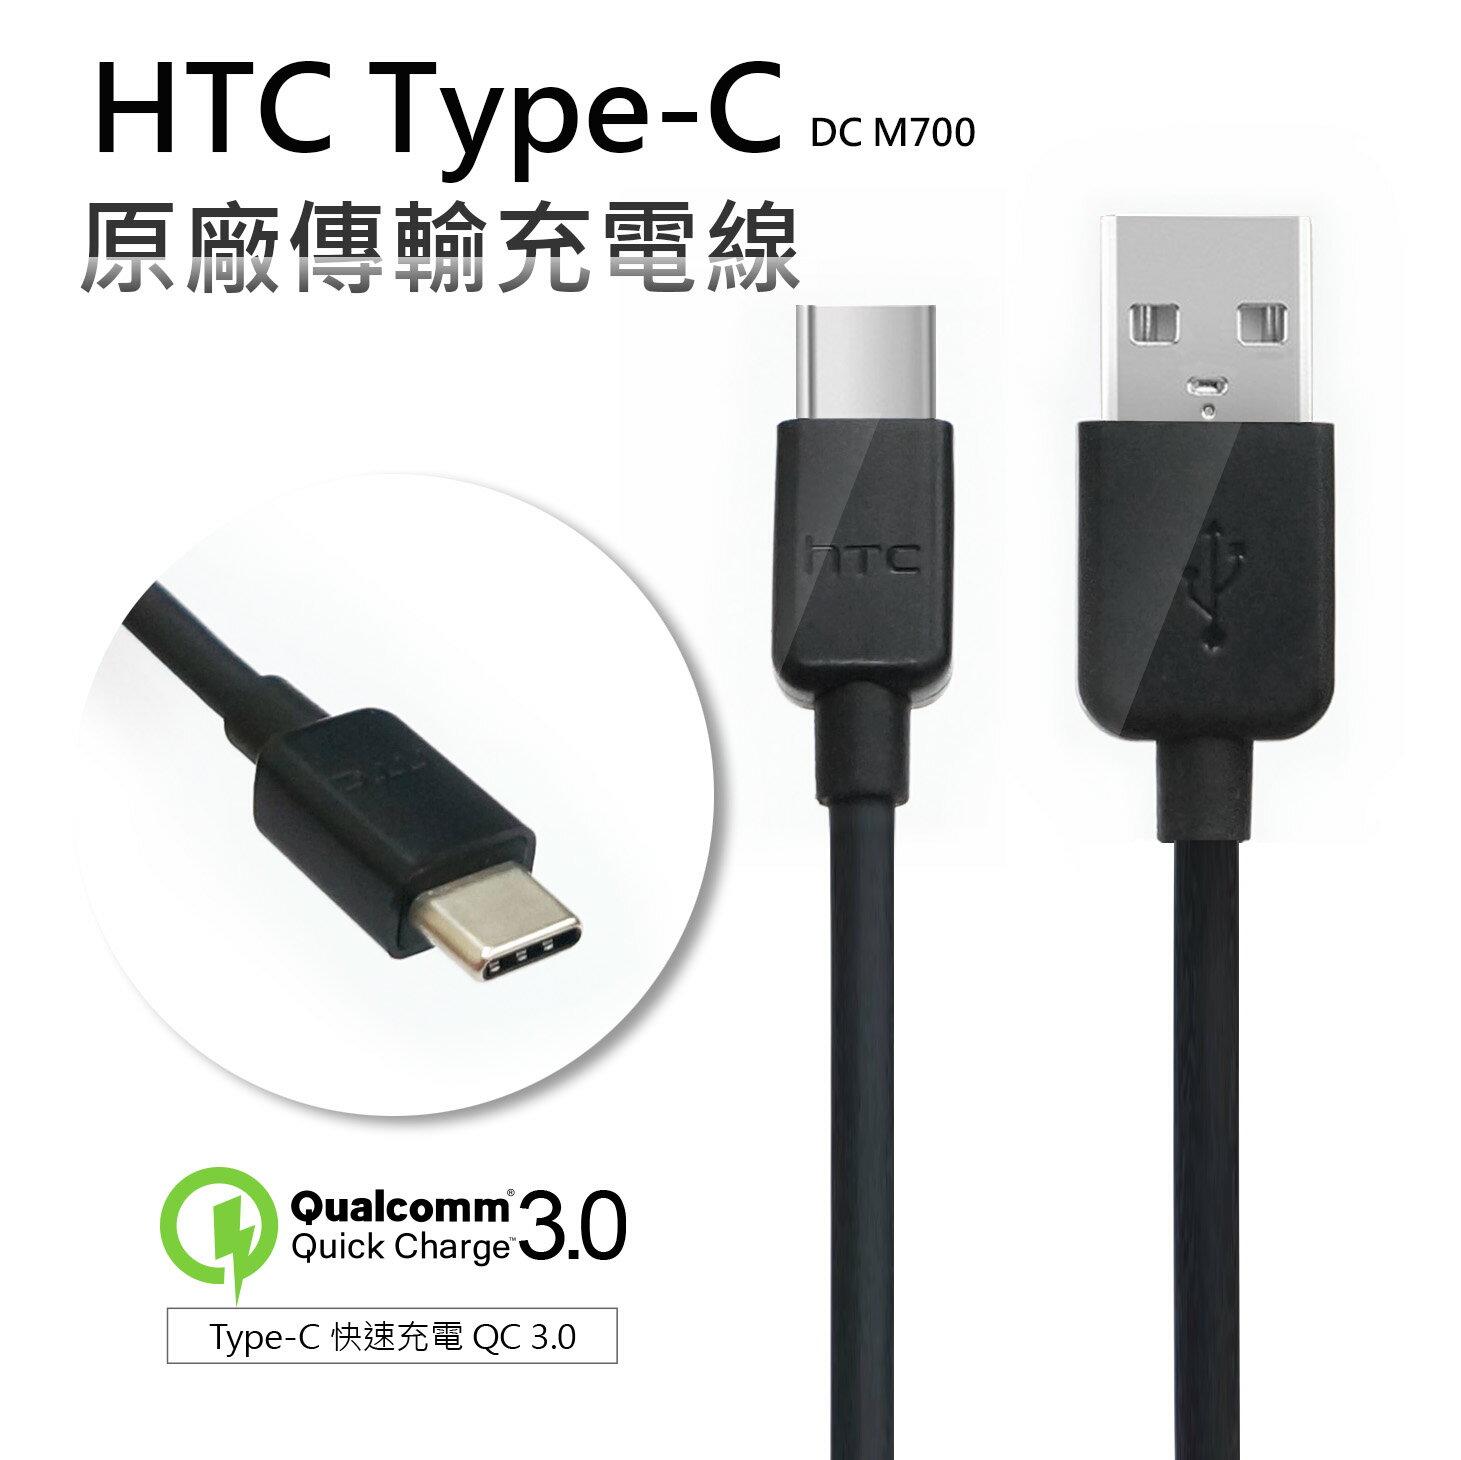 HTC原廠TYPE-C充電傳輸線 DC M700 USB-C Type-C 原廠高速傳輸線 快速充電線 快充線 (密封包裝)